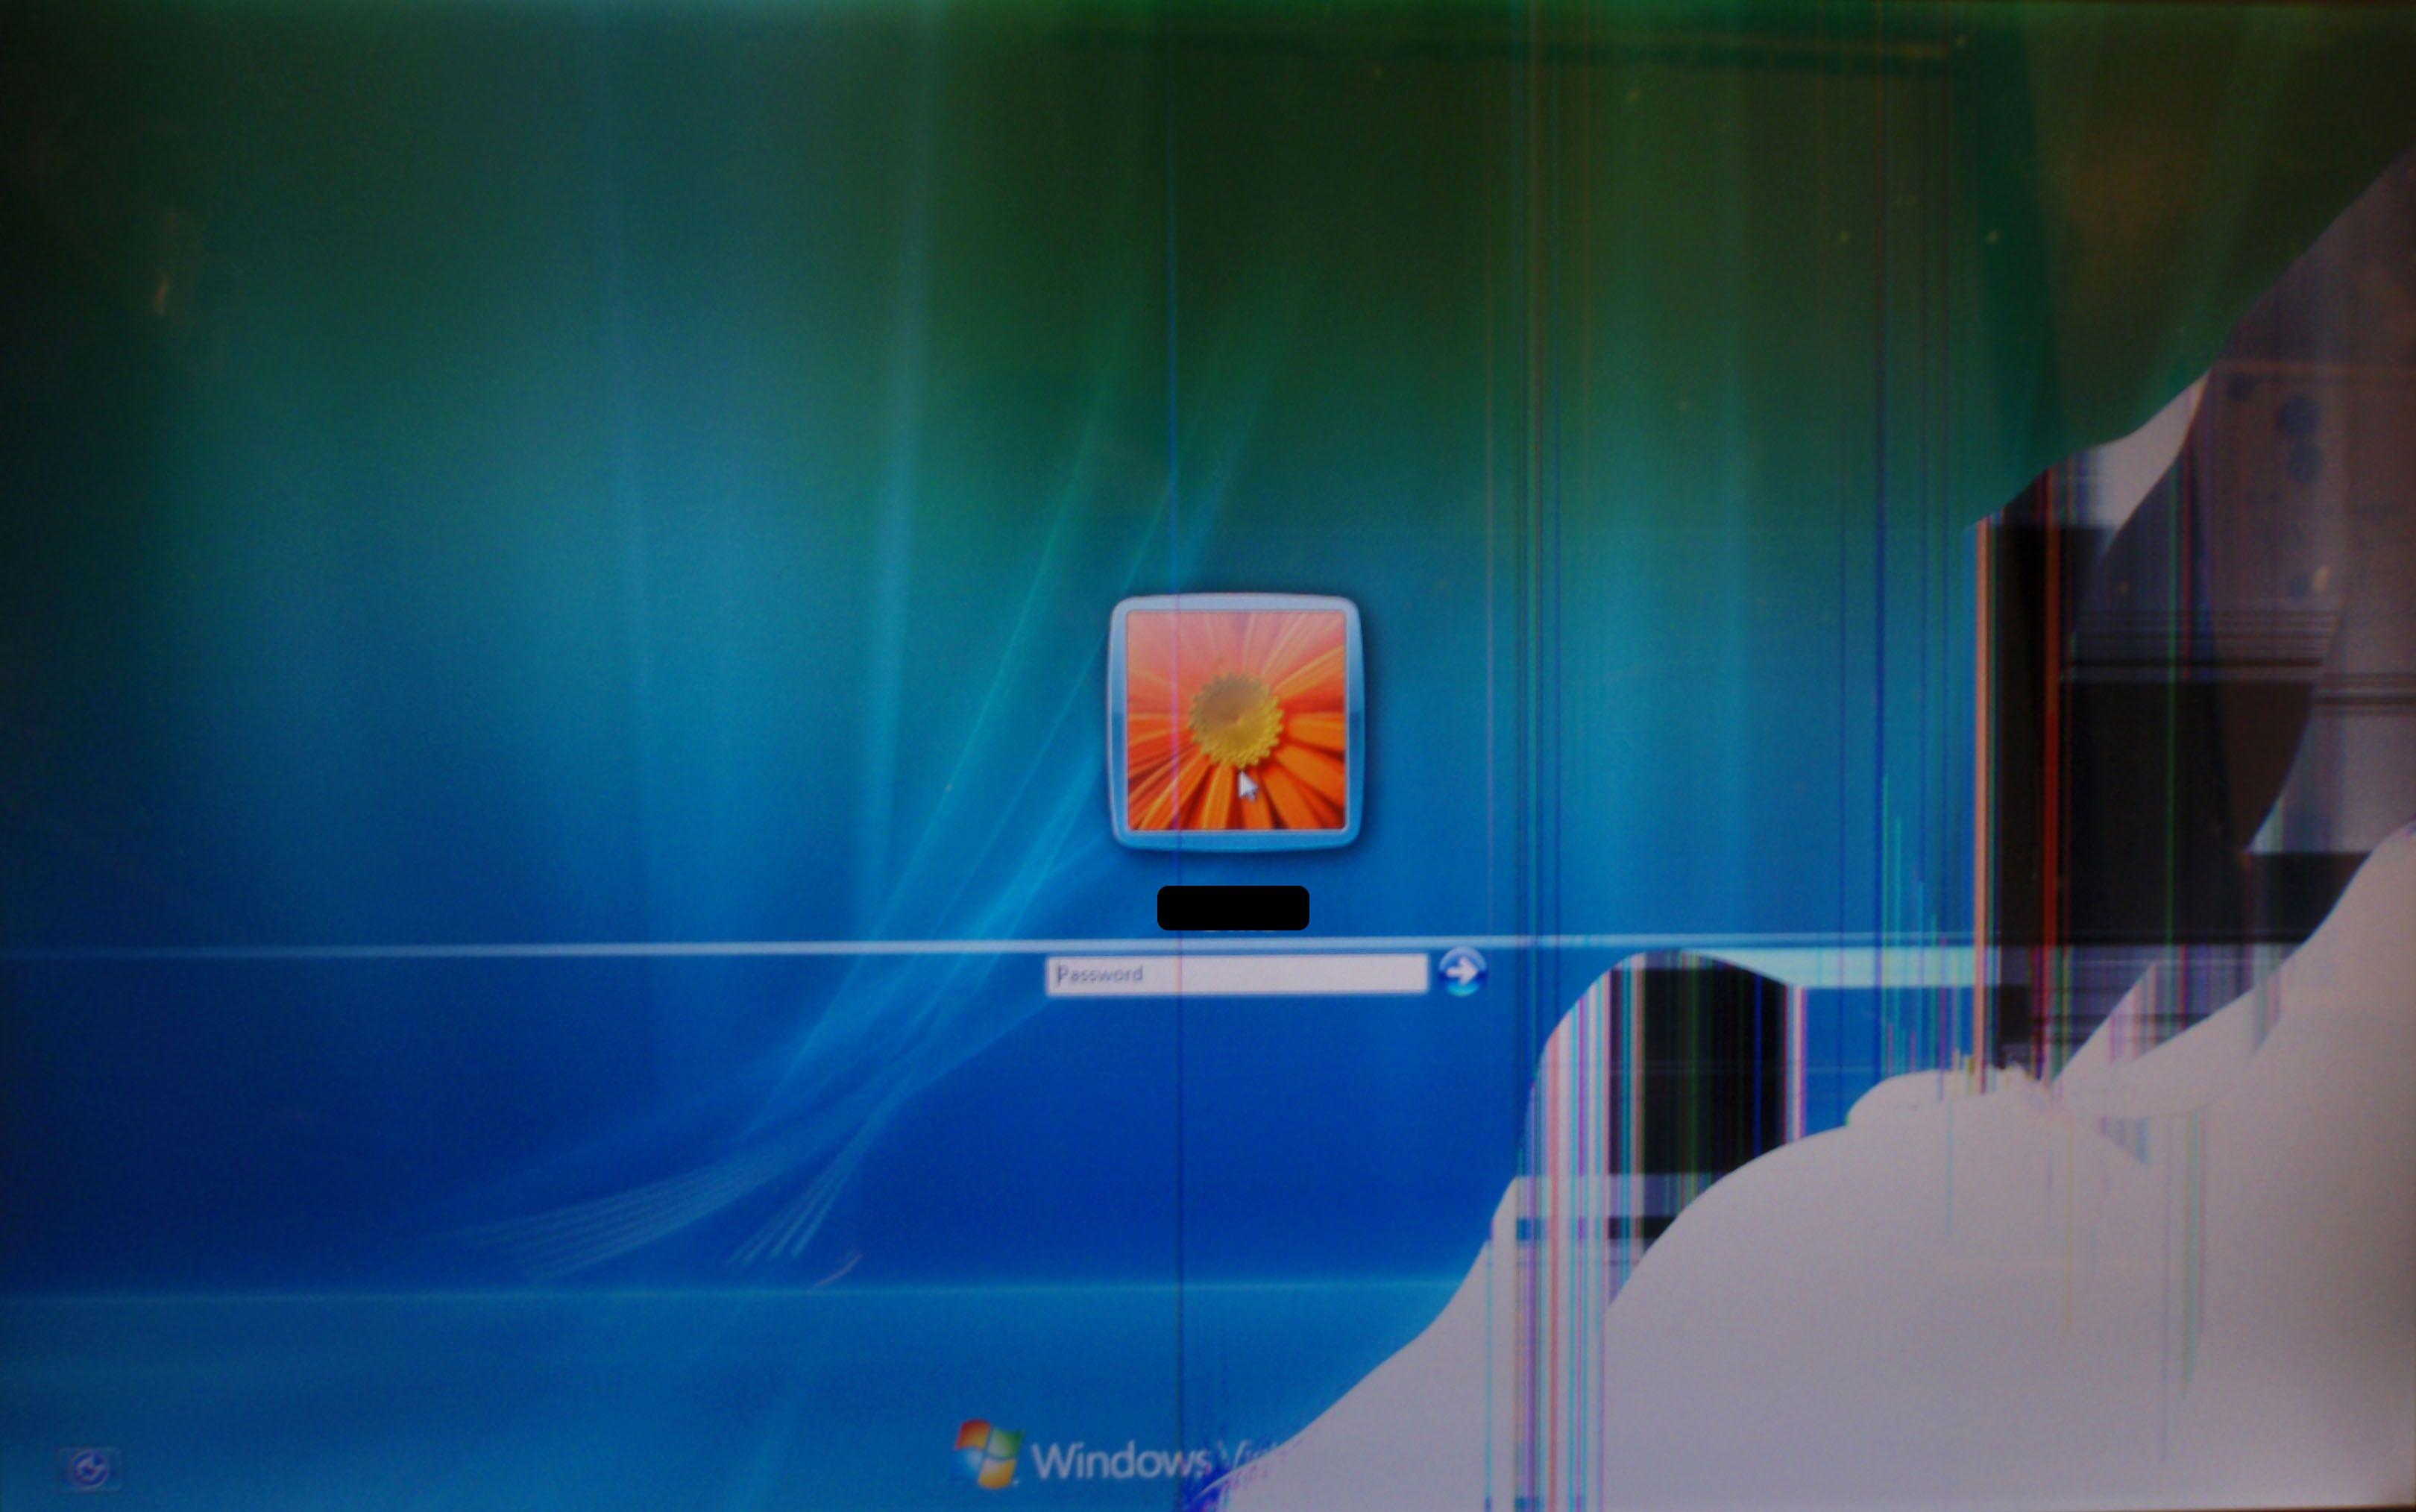 Broken Screen Wallpaper Windows Vista Login 2018 Wallpapers HD